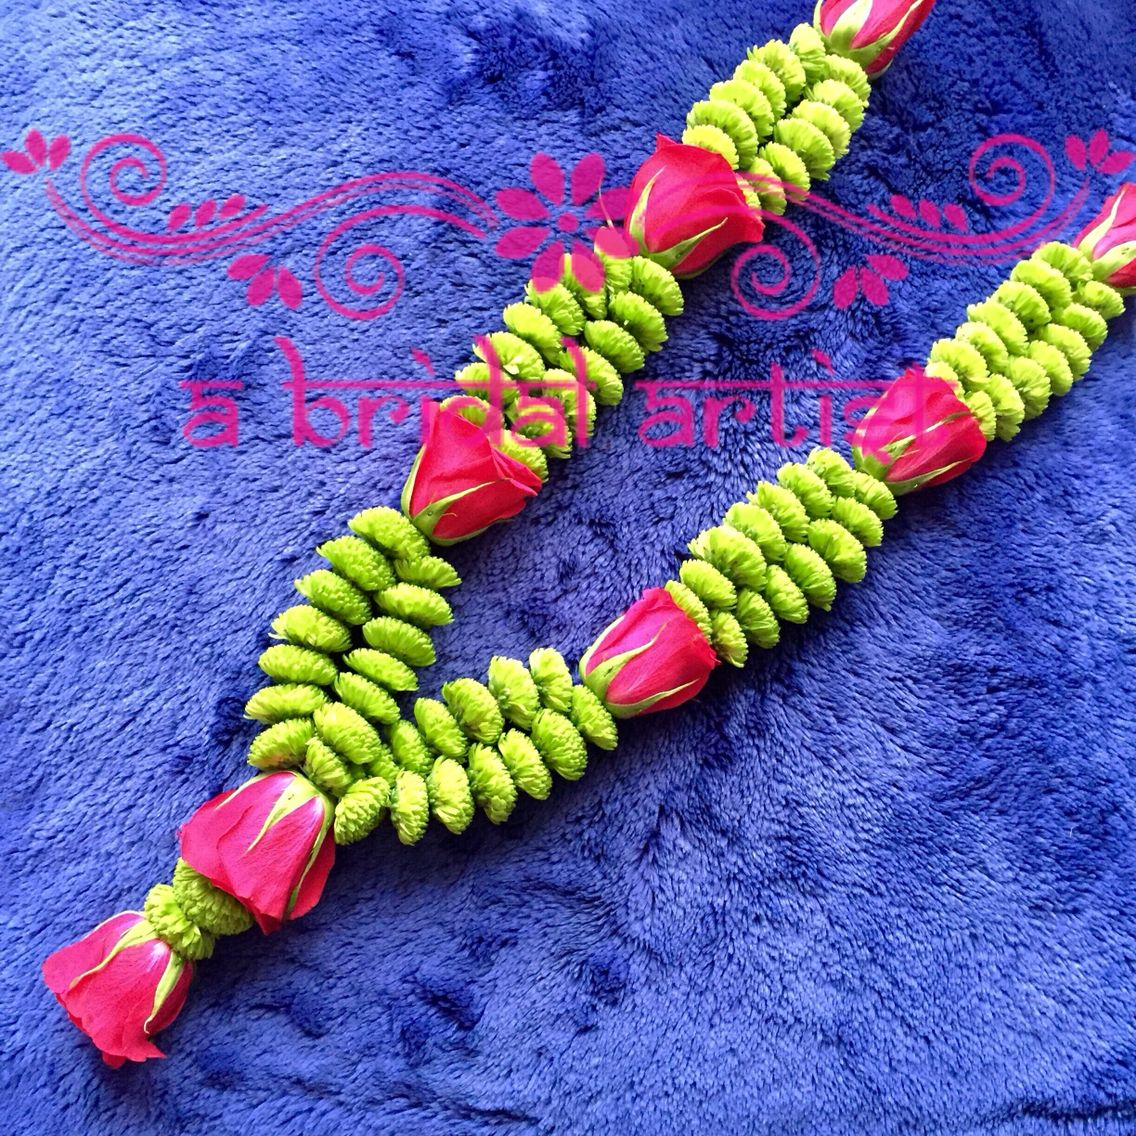 Exquisite Designer Wedding Garland (jaimala / Haar / Varmala) Made From Fresh  Flowers.